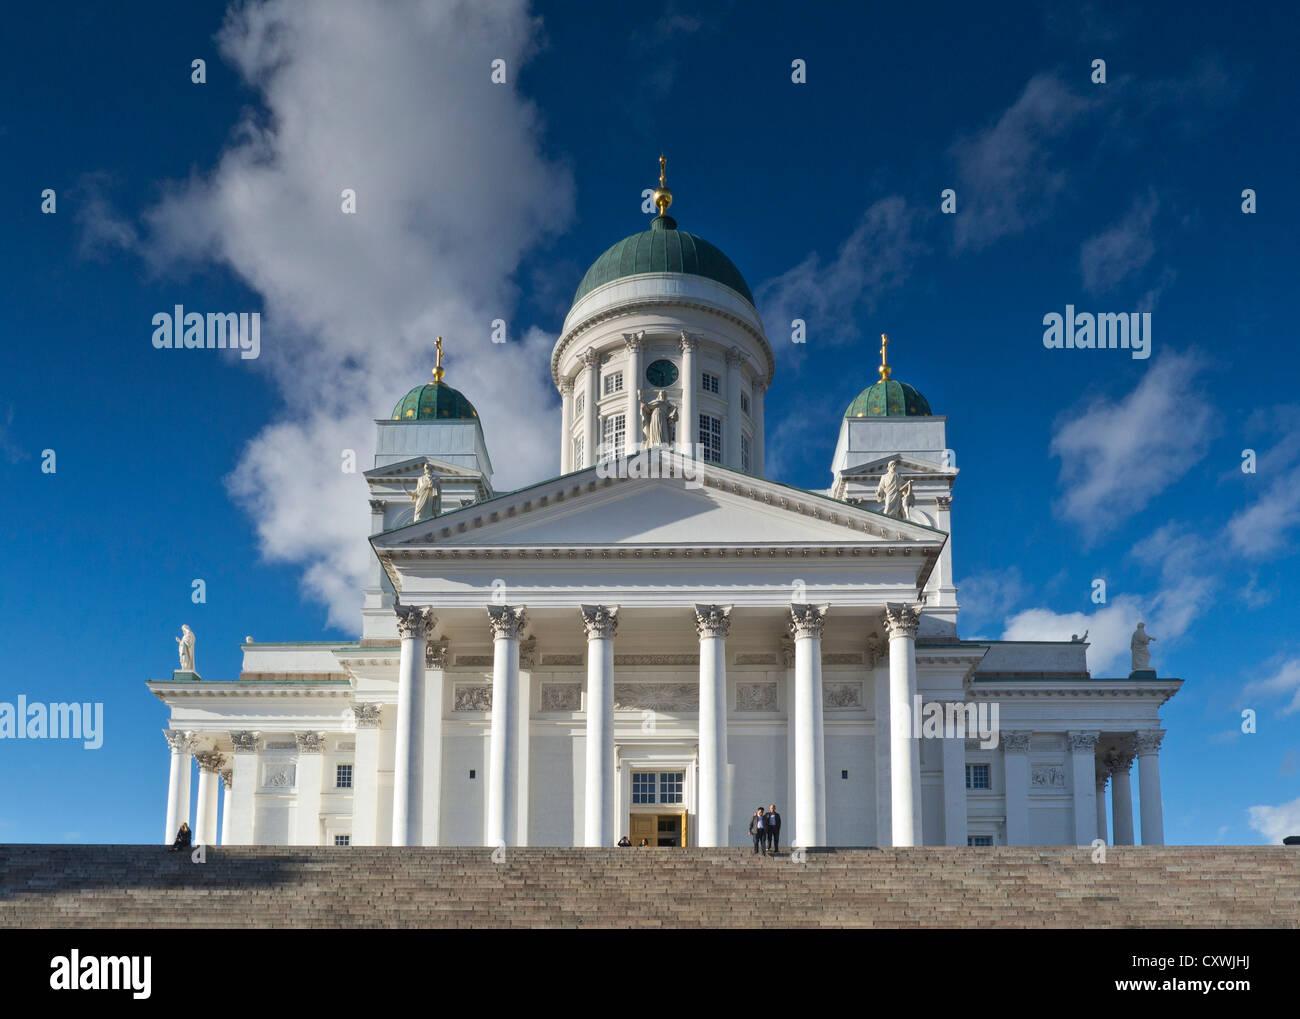 The landmark Helsinki Cathedral Senate Square Helsinki Finland - Stock Image